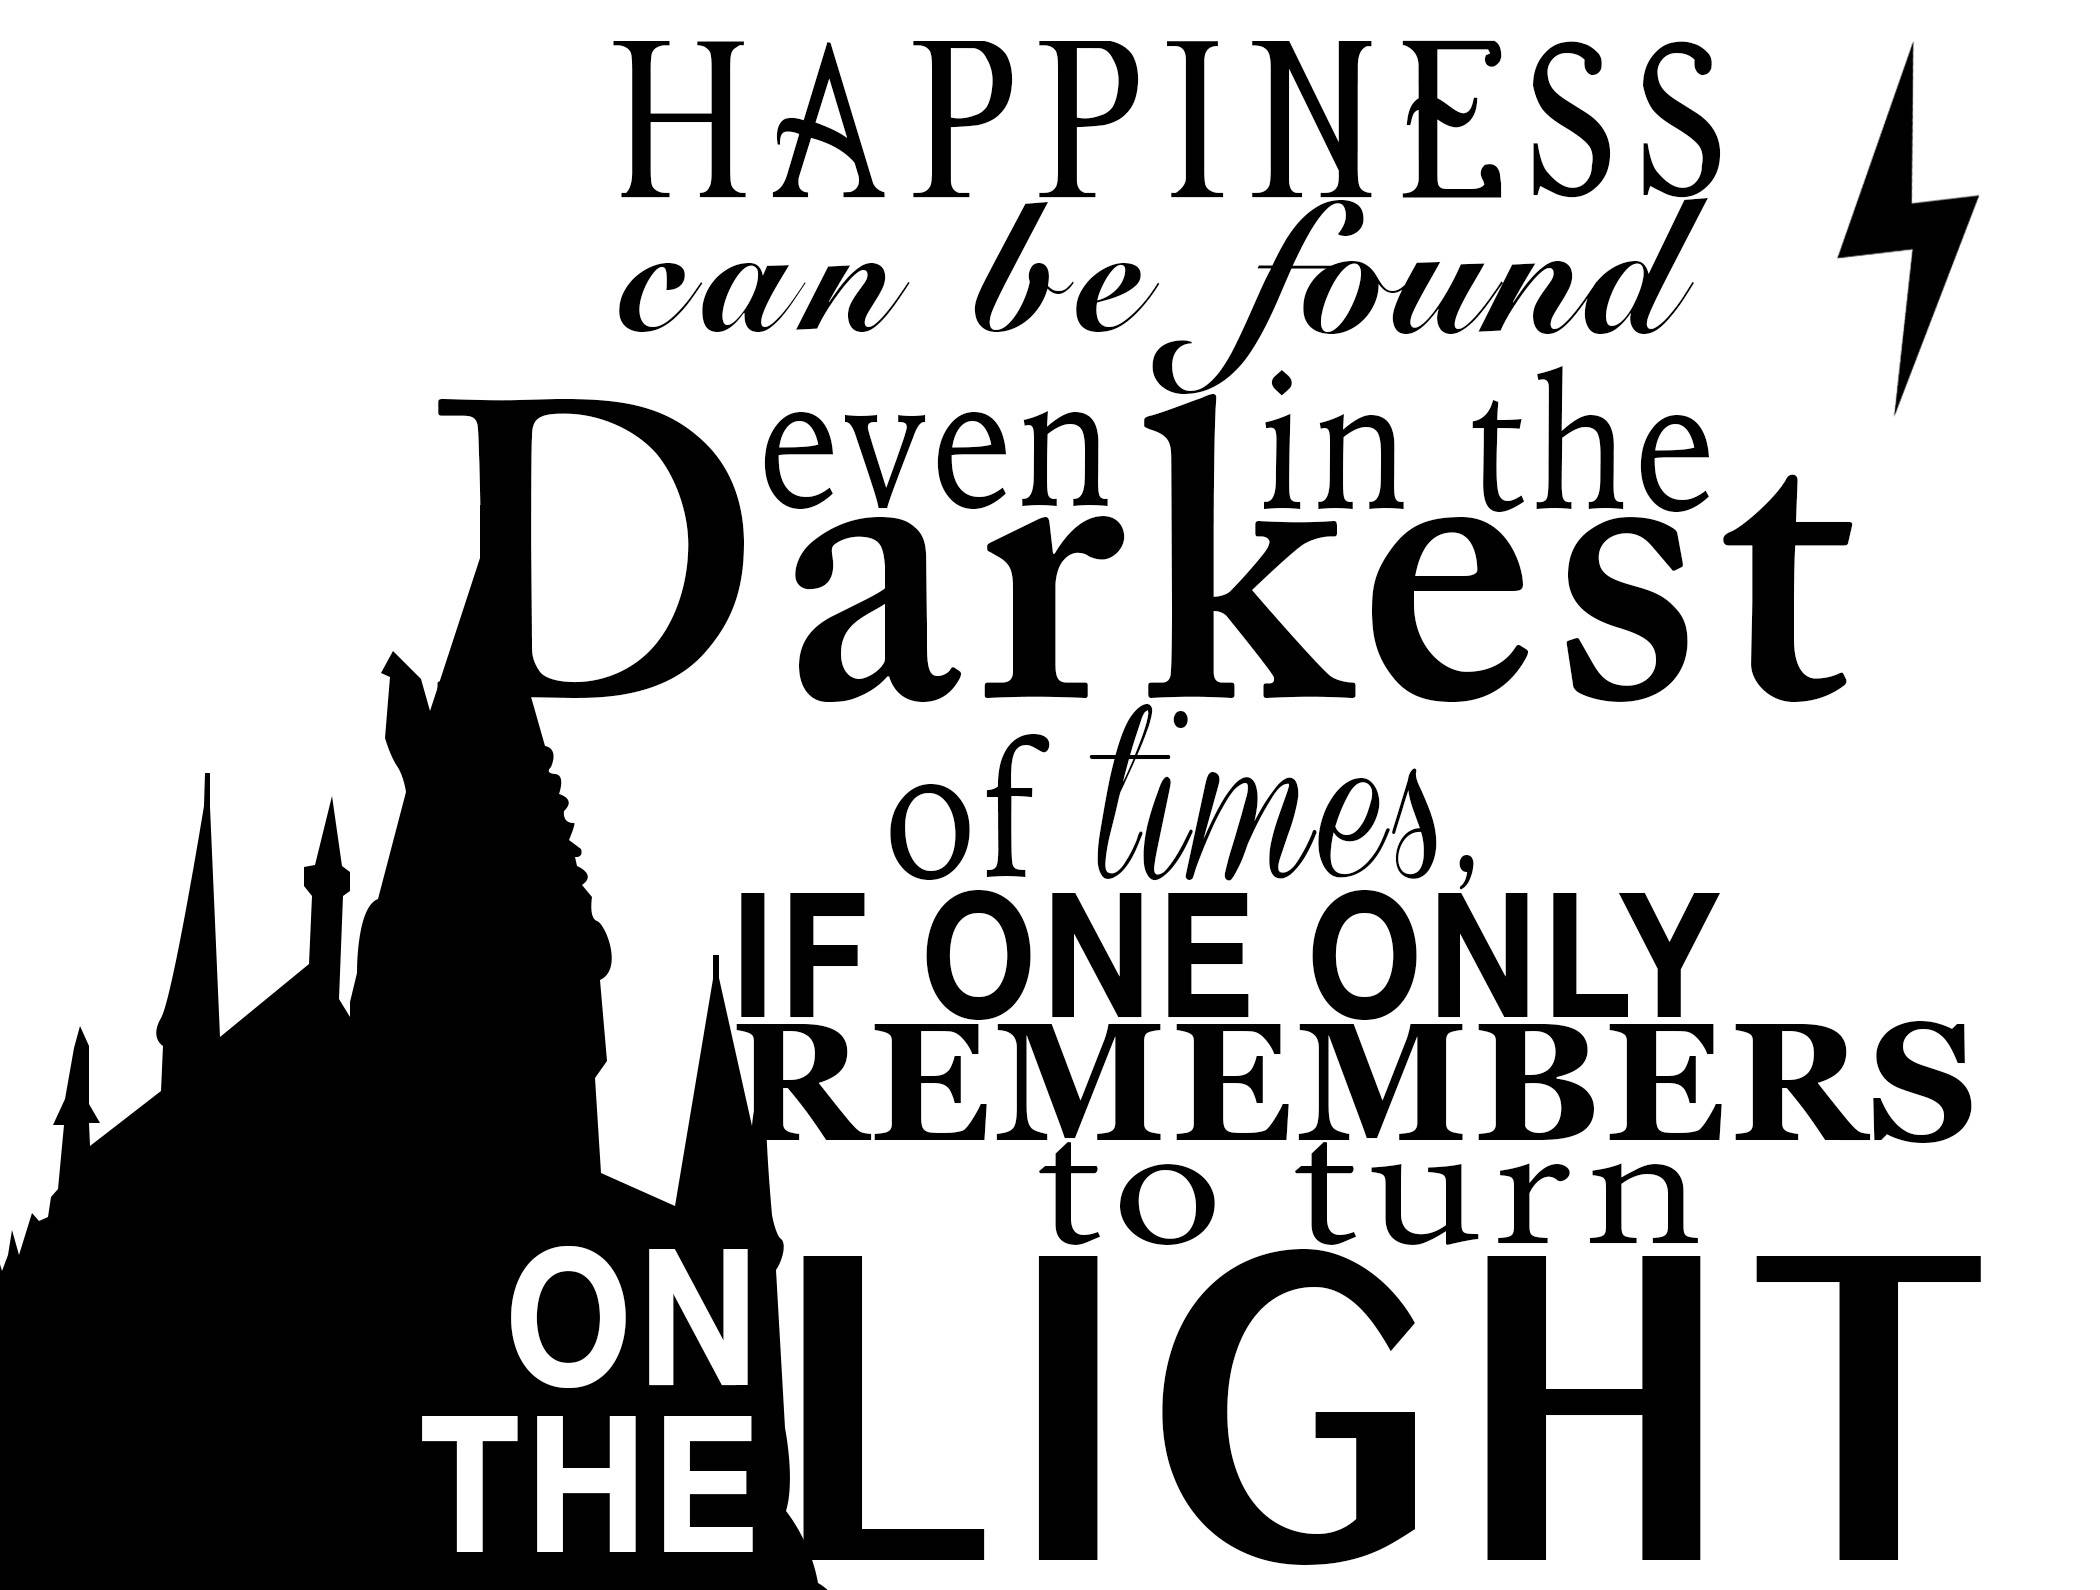 2100x1590 Harry Potter Dumbledore Quote Design For Silhouette Studio